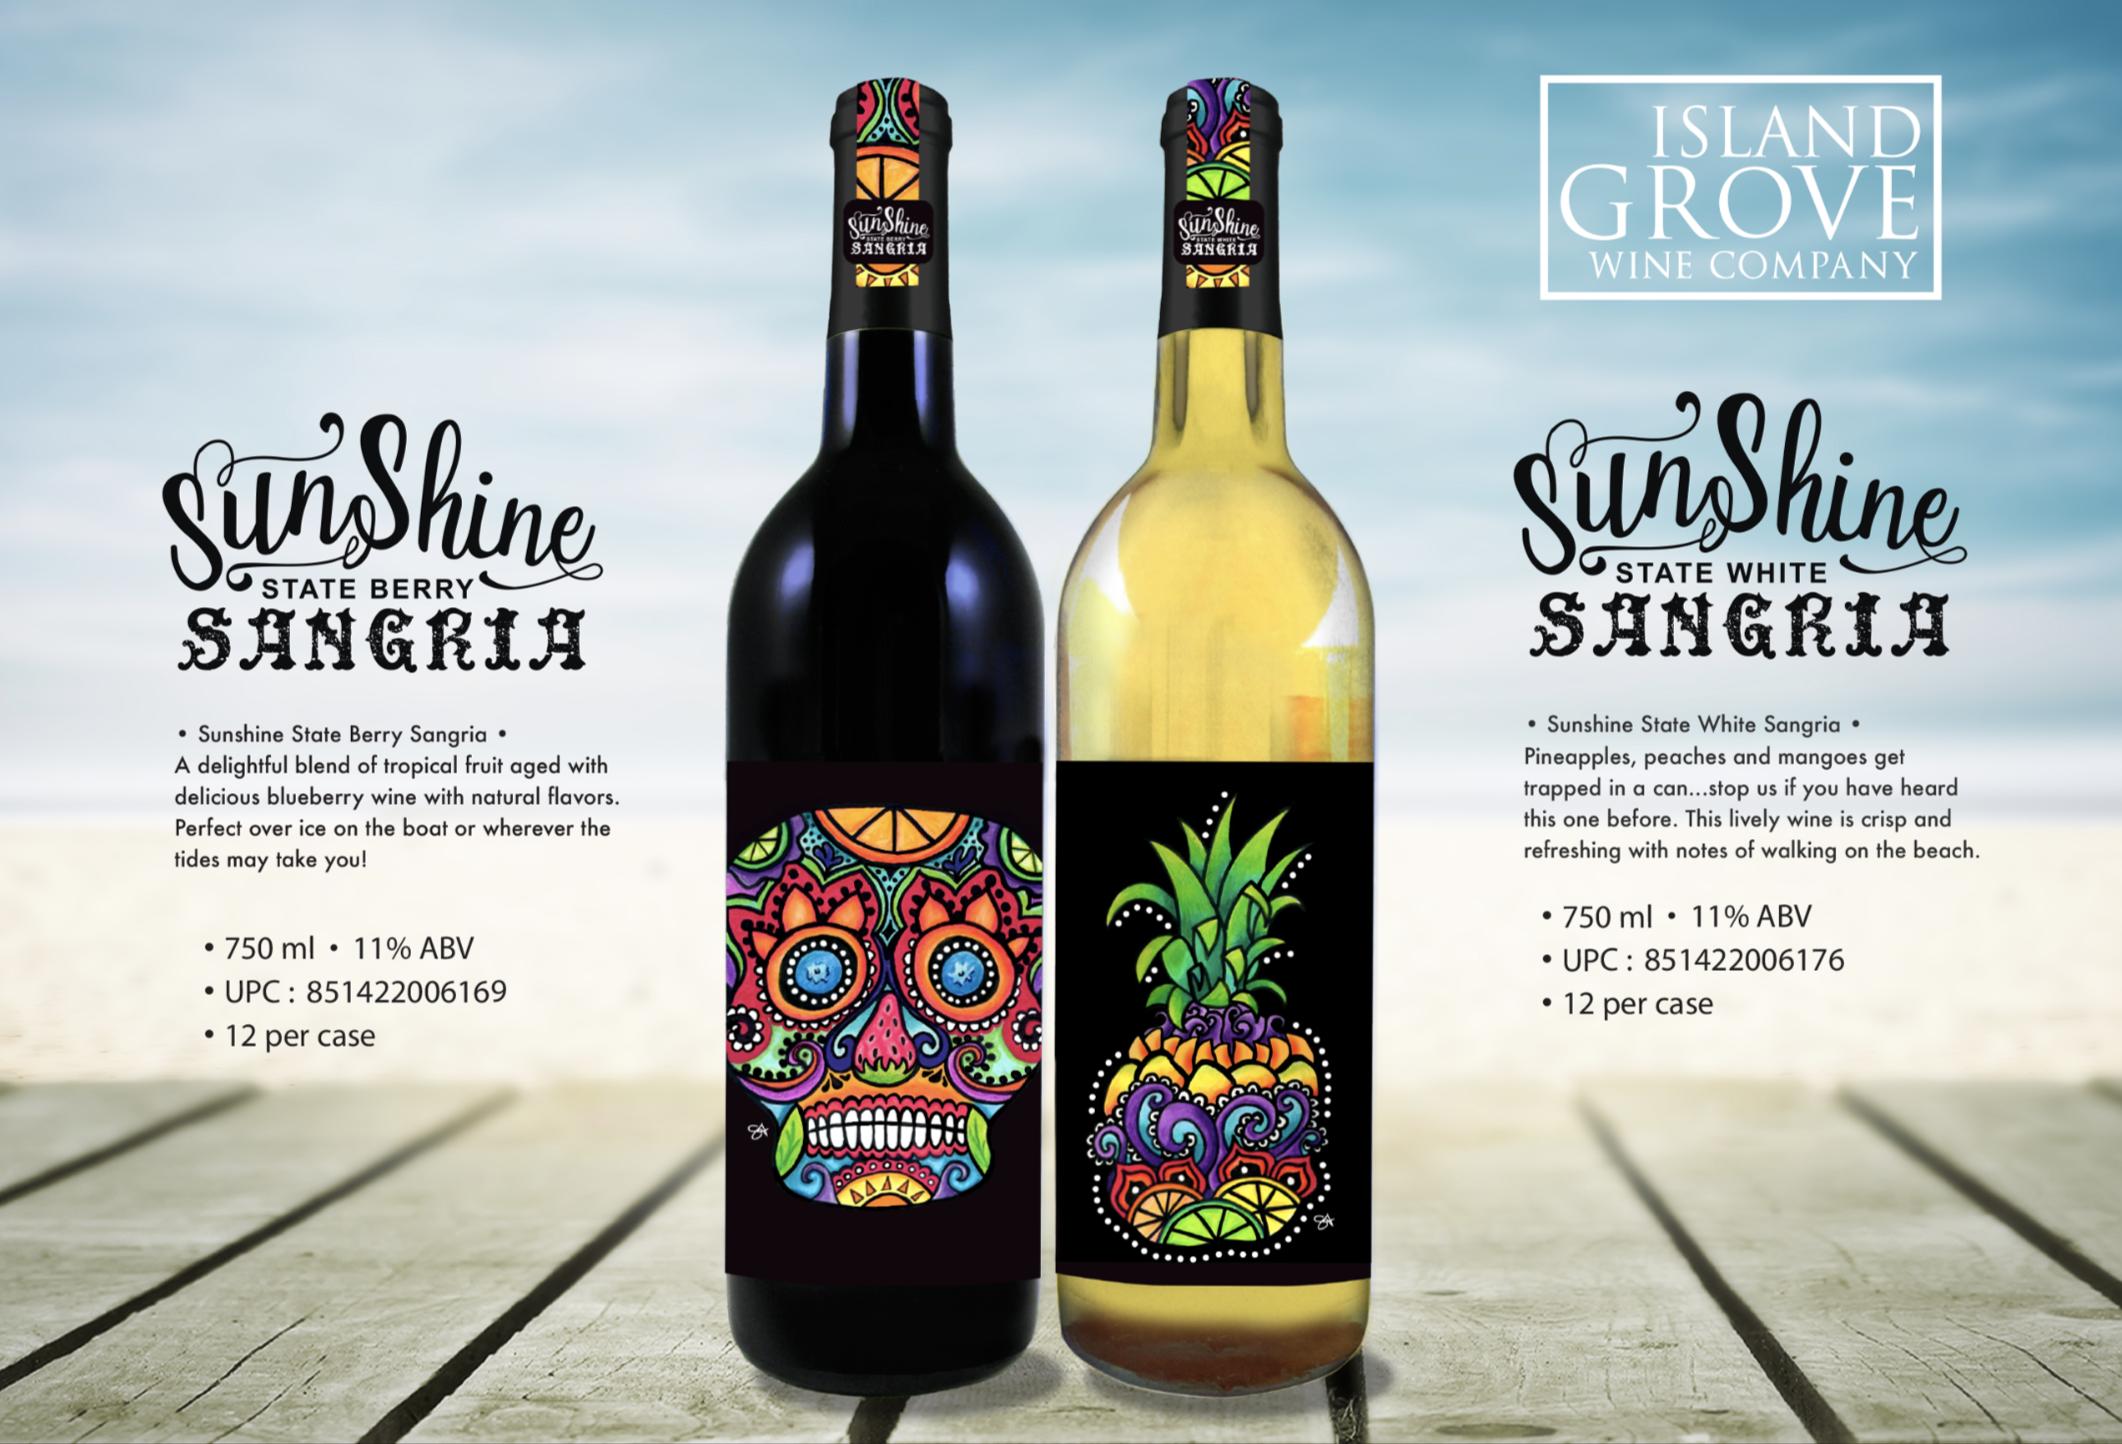 Island Grove Wine Company